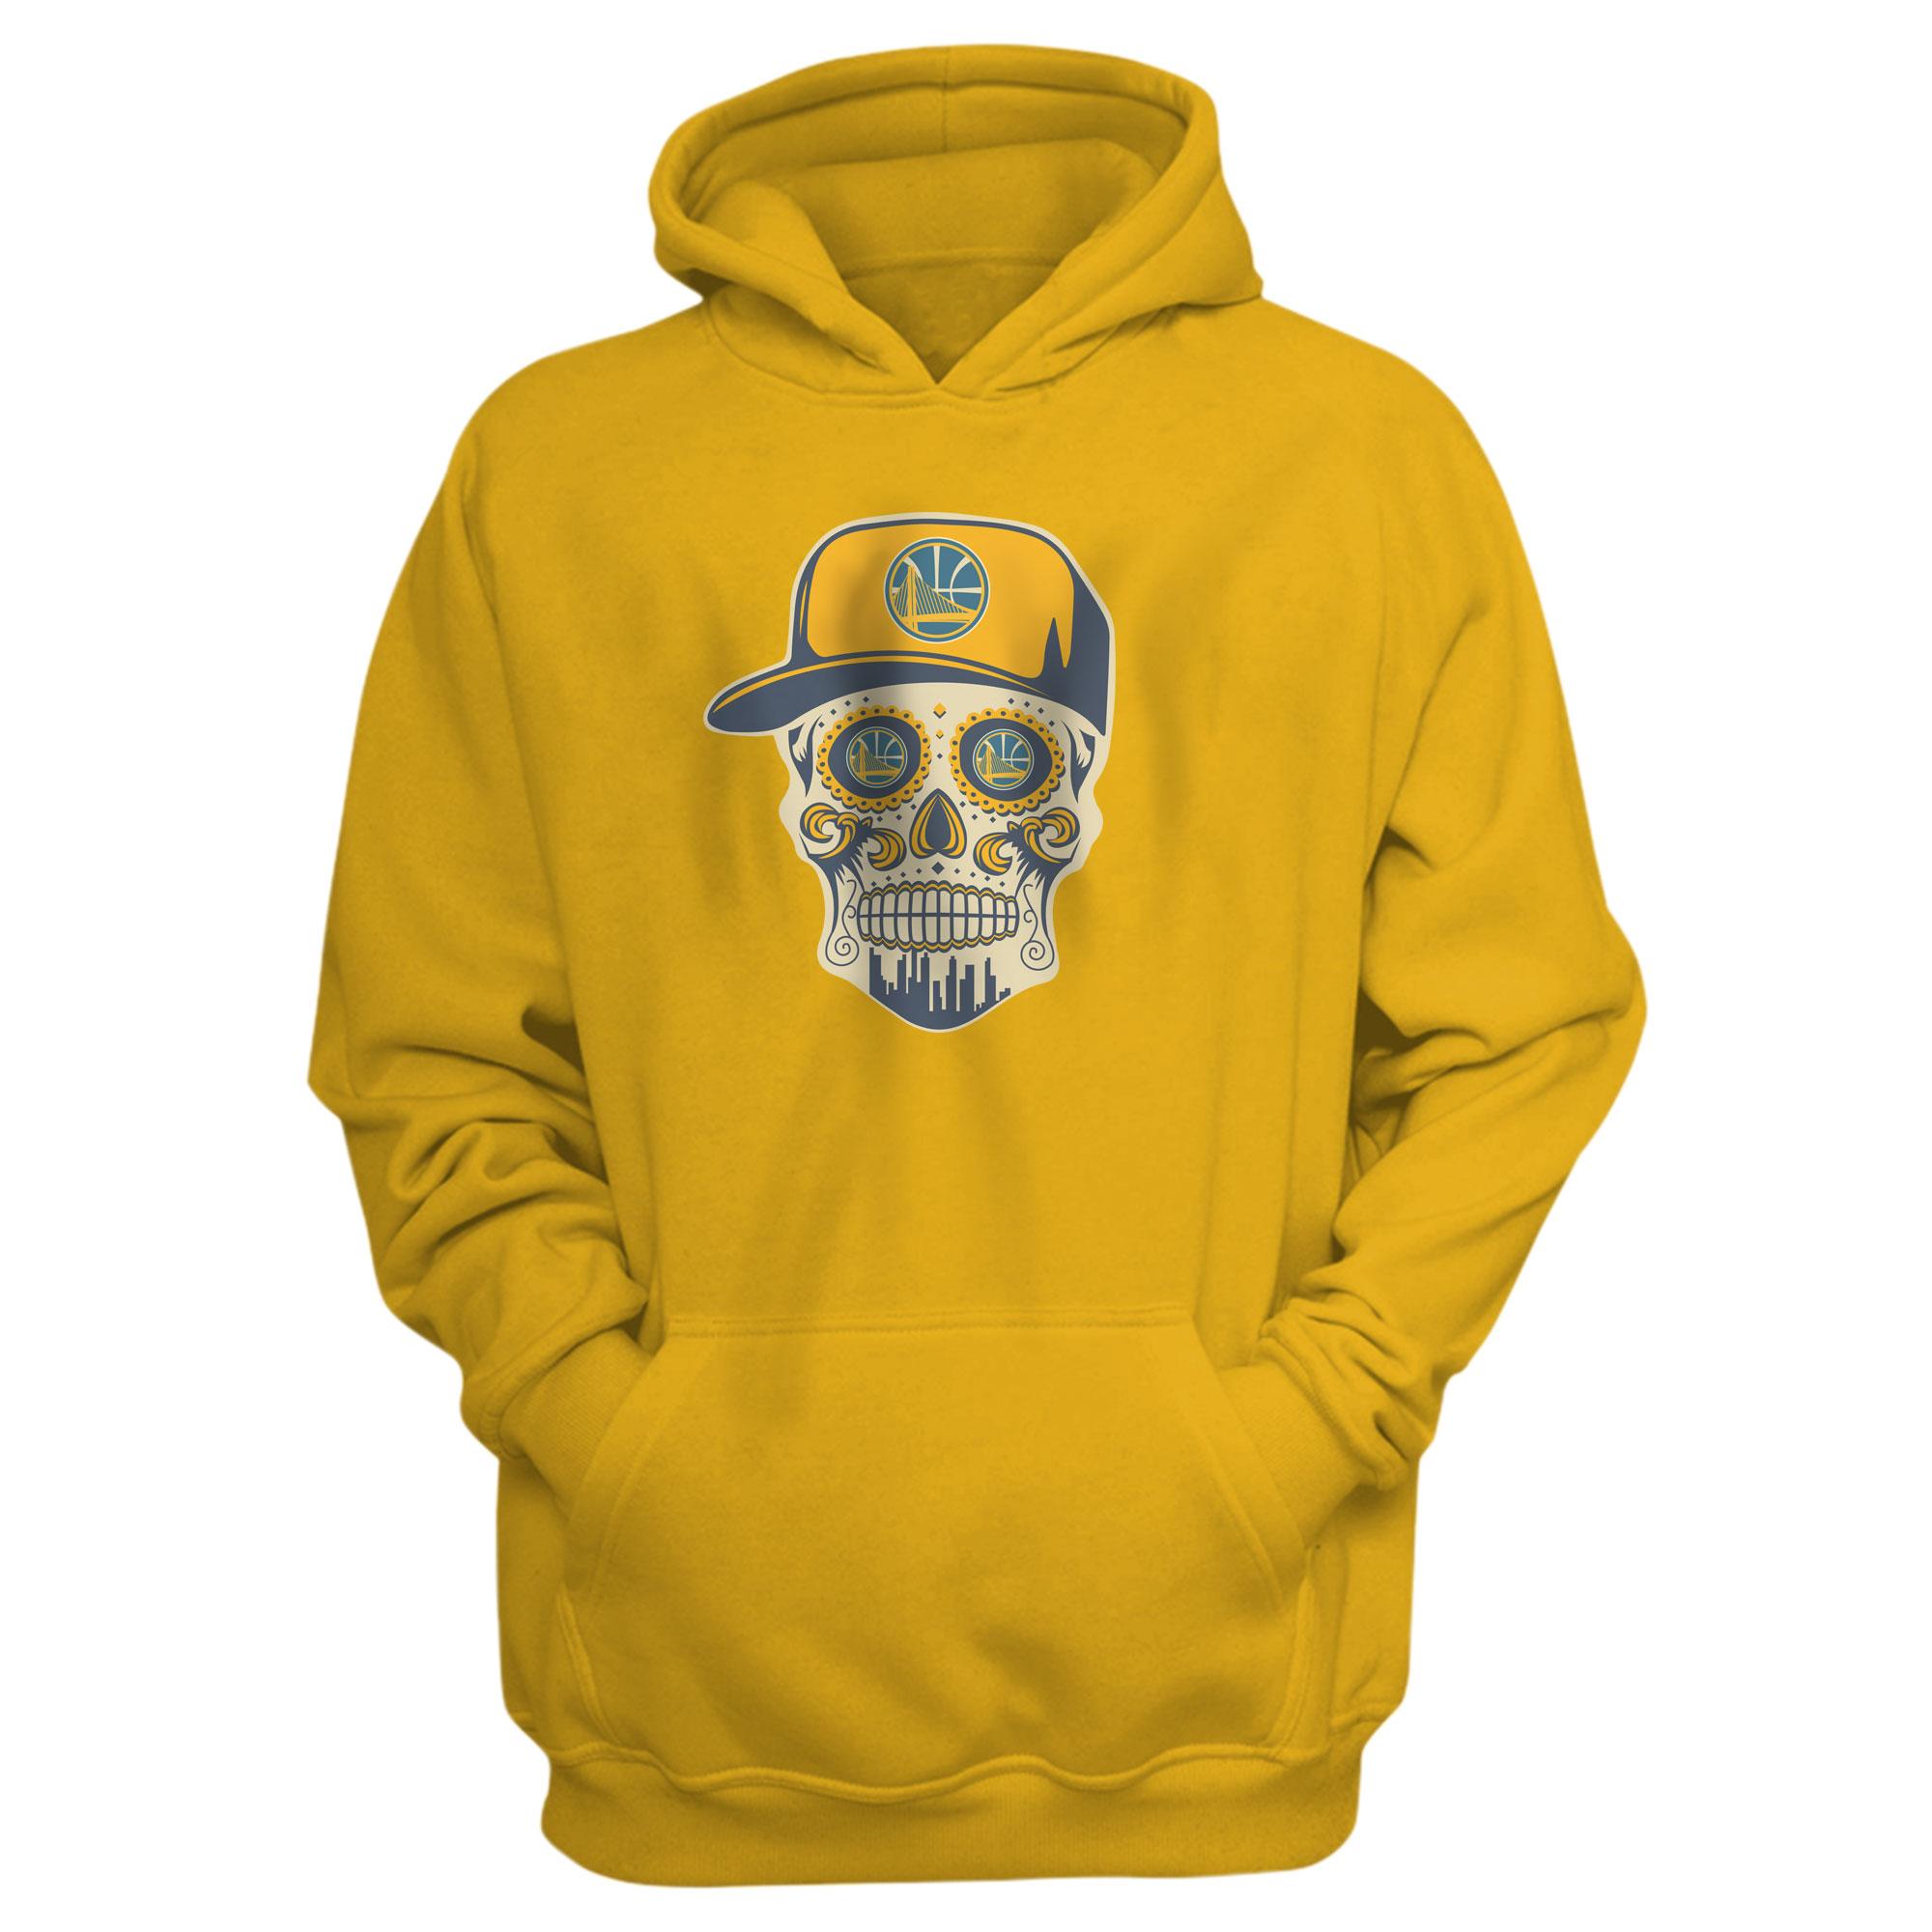 Warriors Skull Hoodie (HD-YLW-NP-452-NBA-GSW-SKULL)